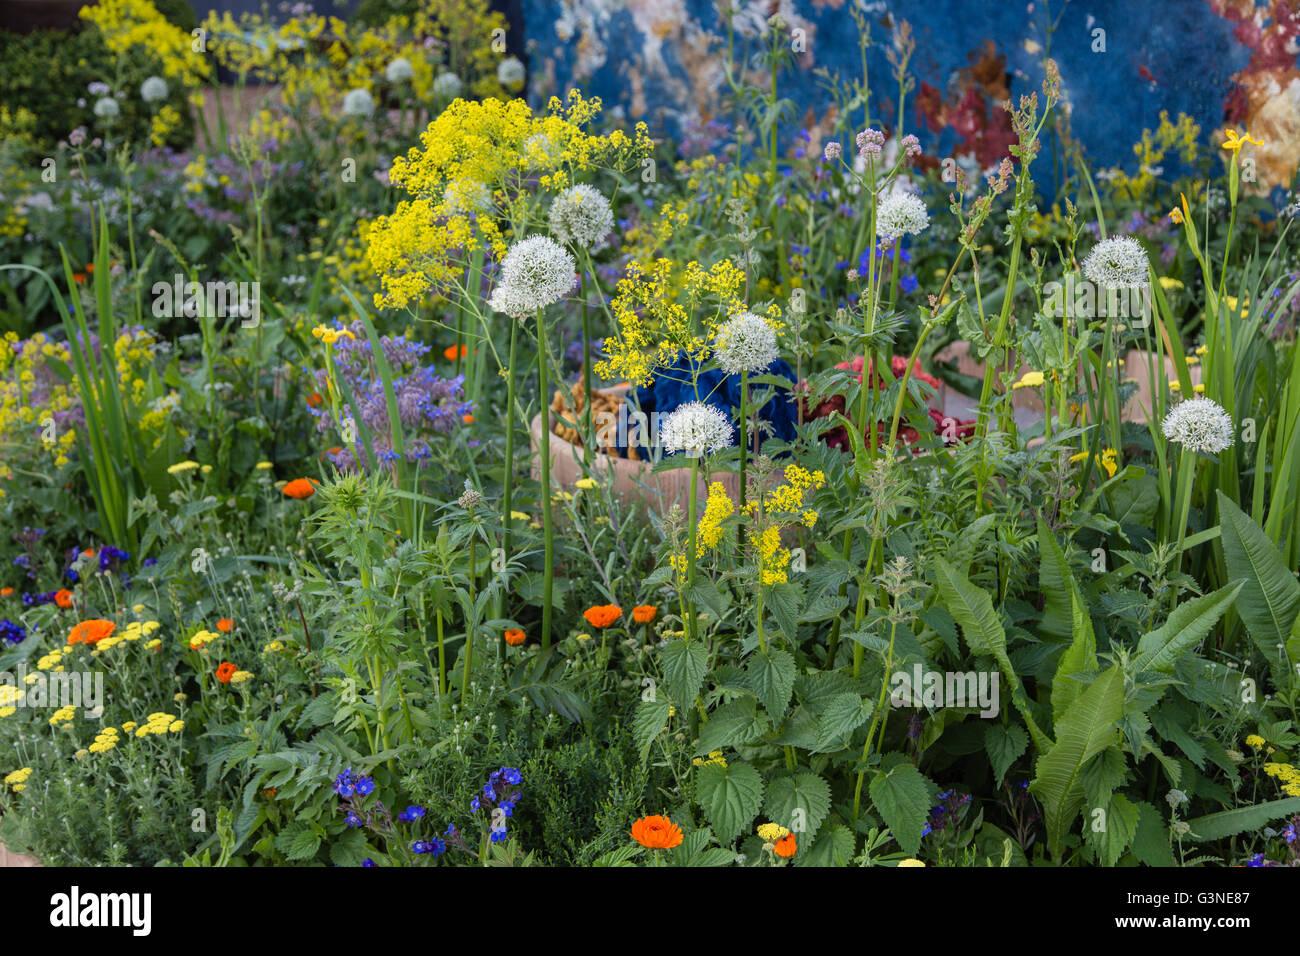 Show gardens at RHS Chelsea Flower show 2016: AkzoNobel Honeysuckle Blue(s) garden Claudy Jongstra, Stefan Jaspers, Stock Photo